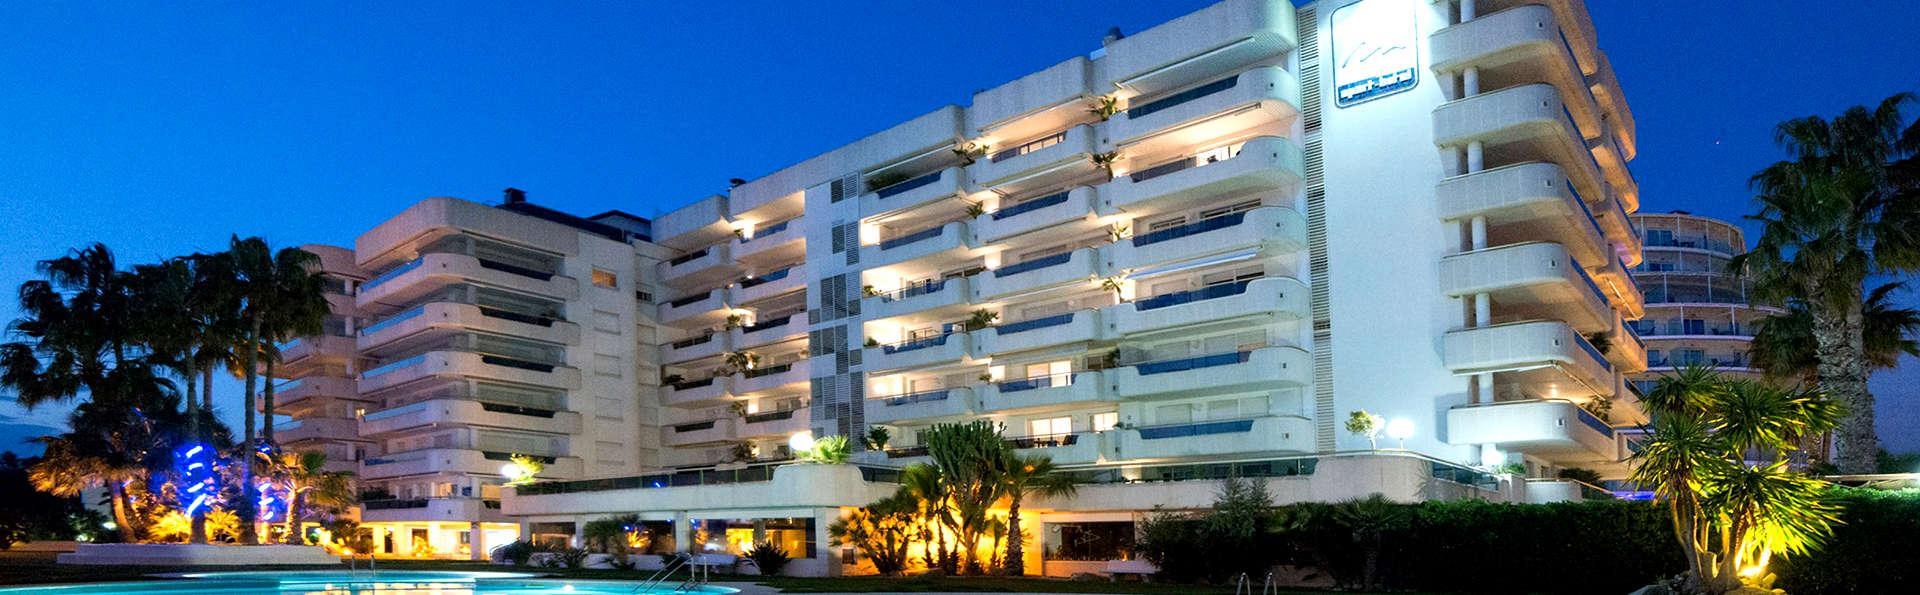 Mediterraneo Sitges Apartments - Edit_Front2.jpg